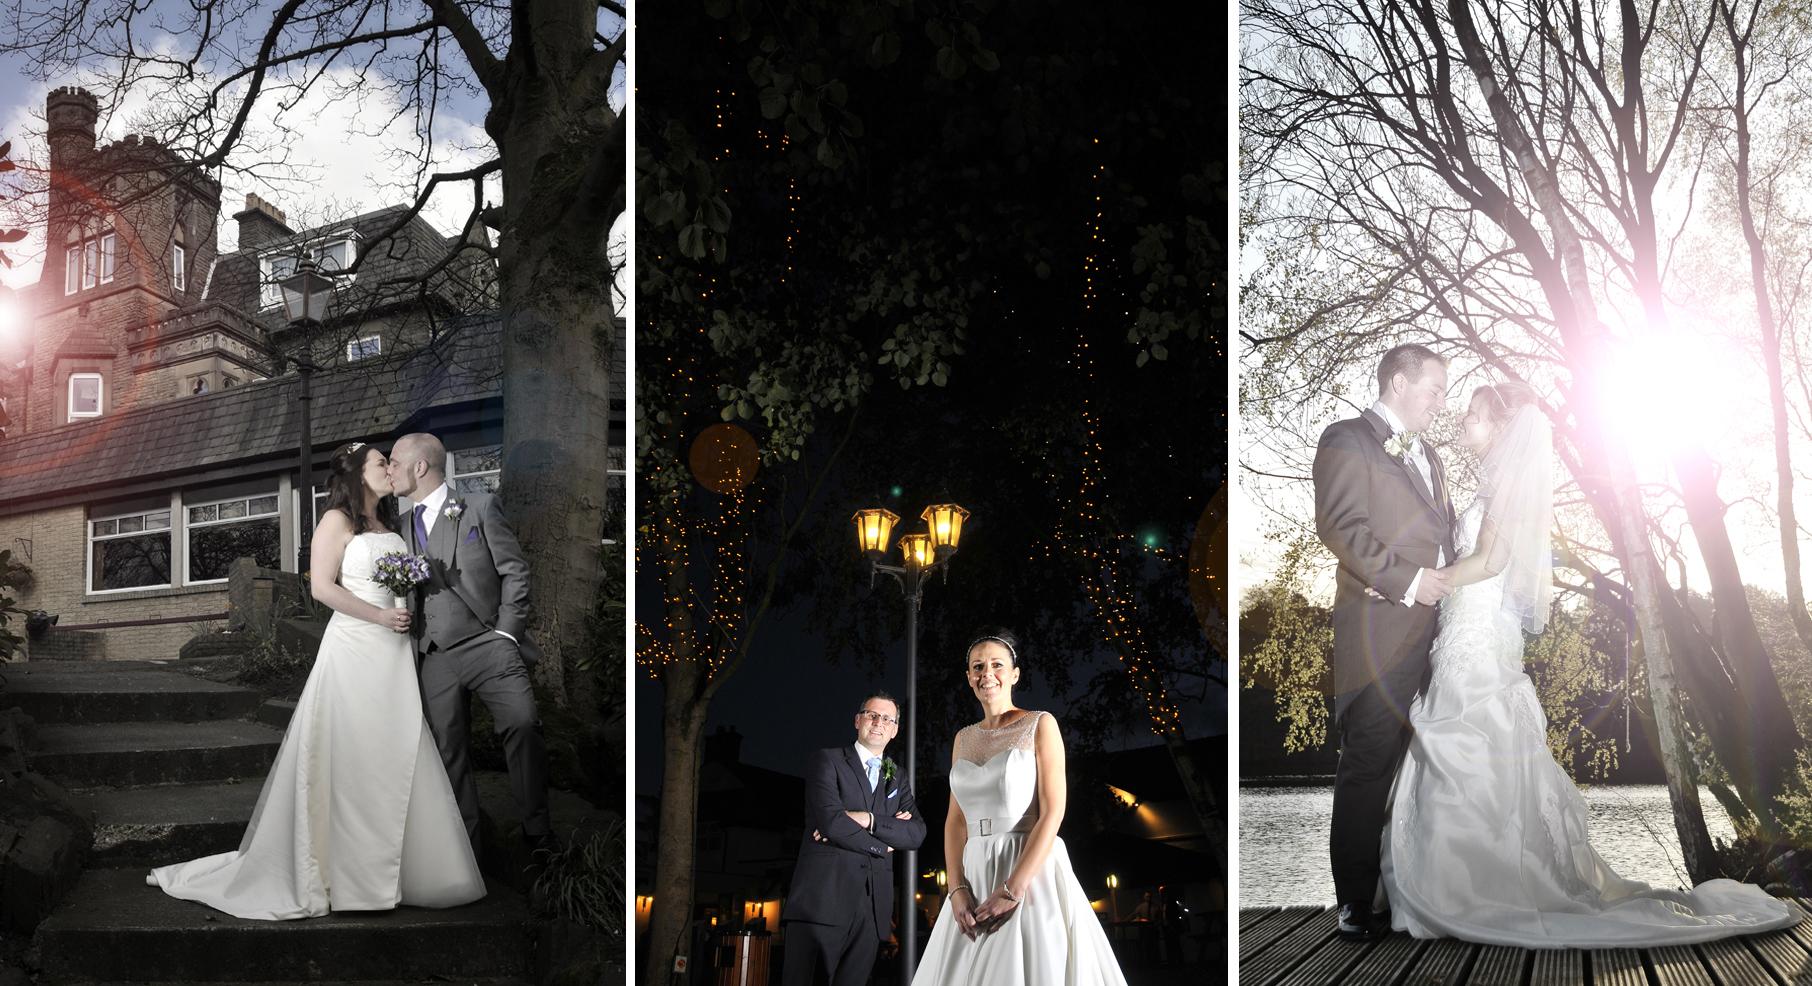 Three wedding images